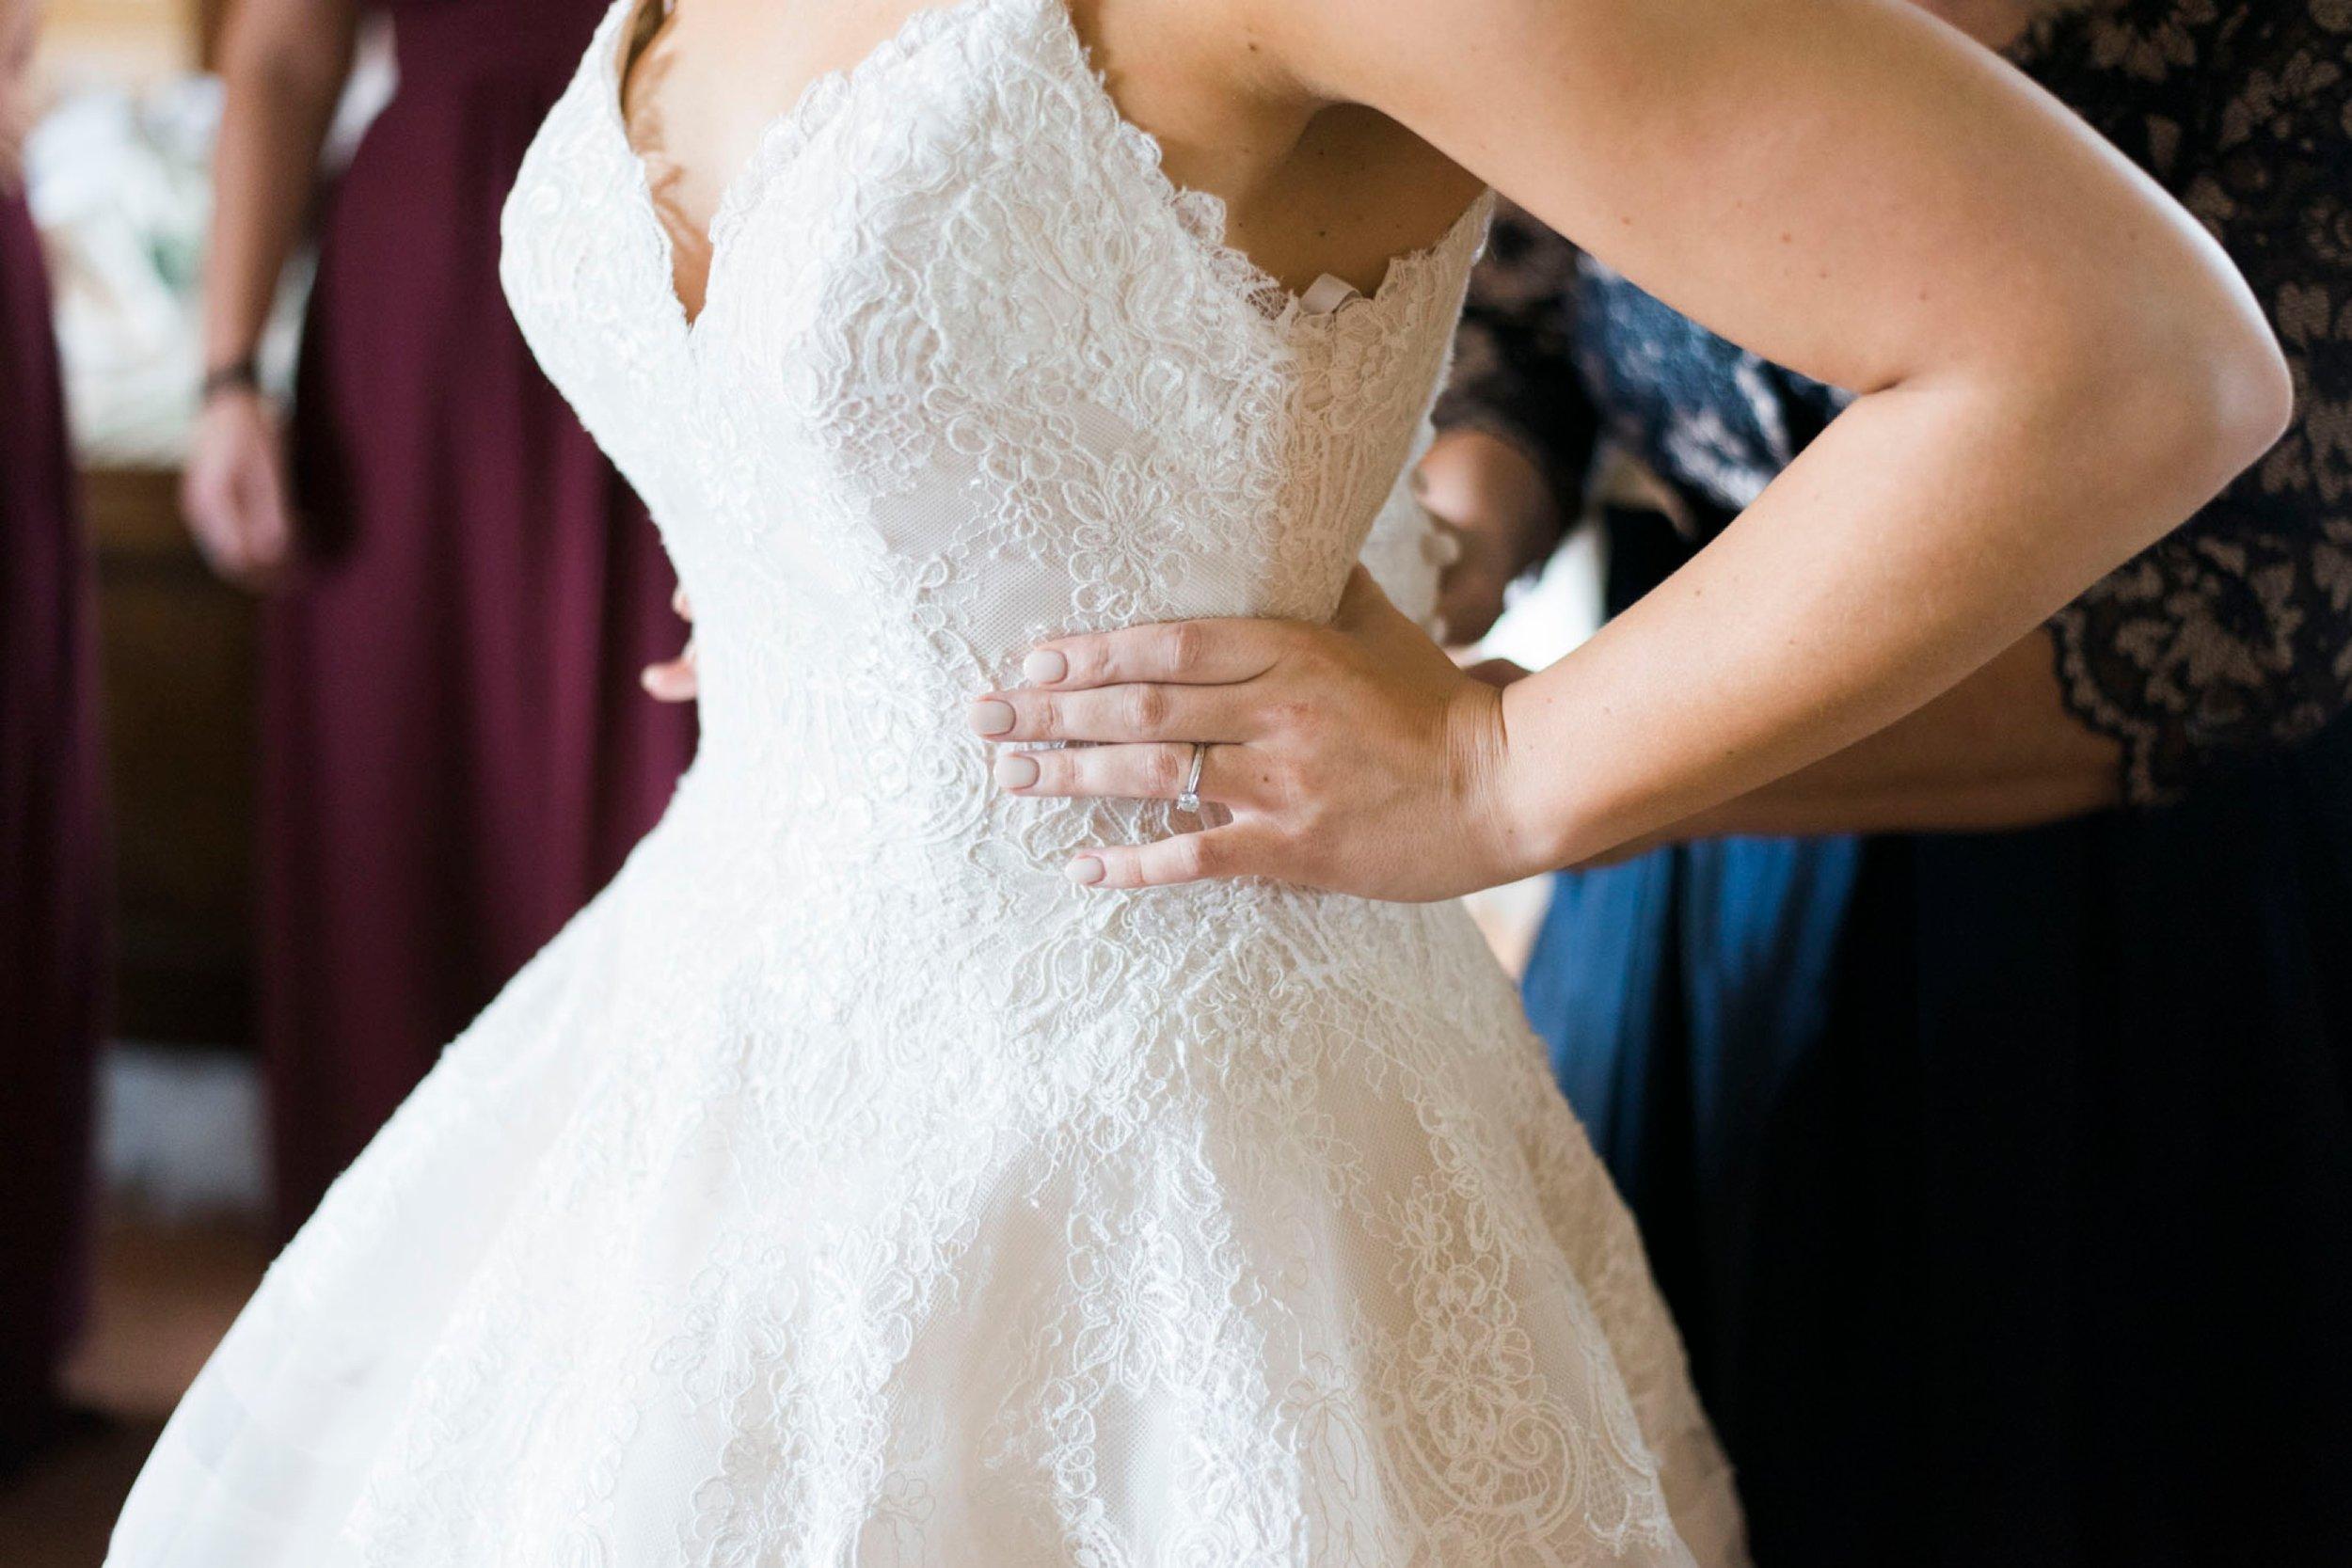 IrvineEstate_LexingtonVA_Wedding_FallWedding_VirginiaWeddingPhotographer 12.jpg